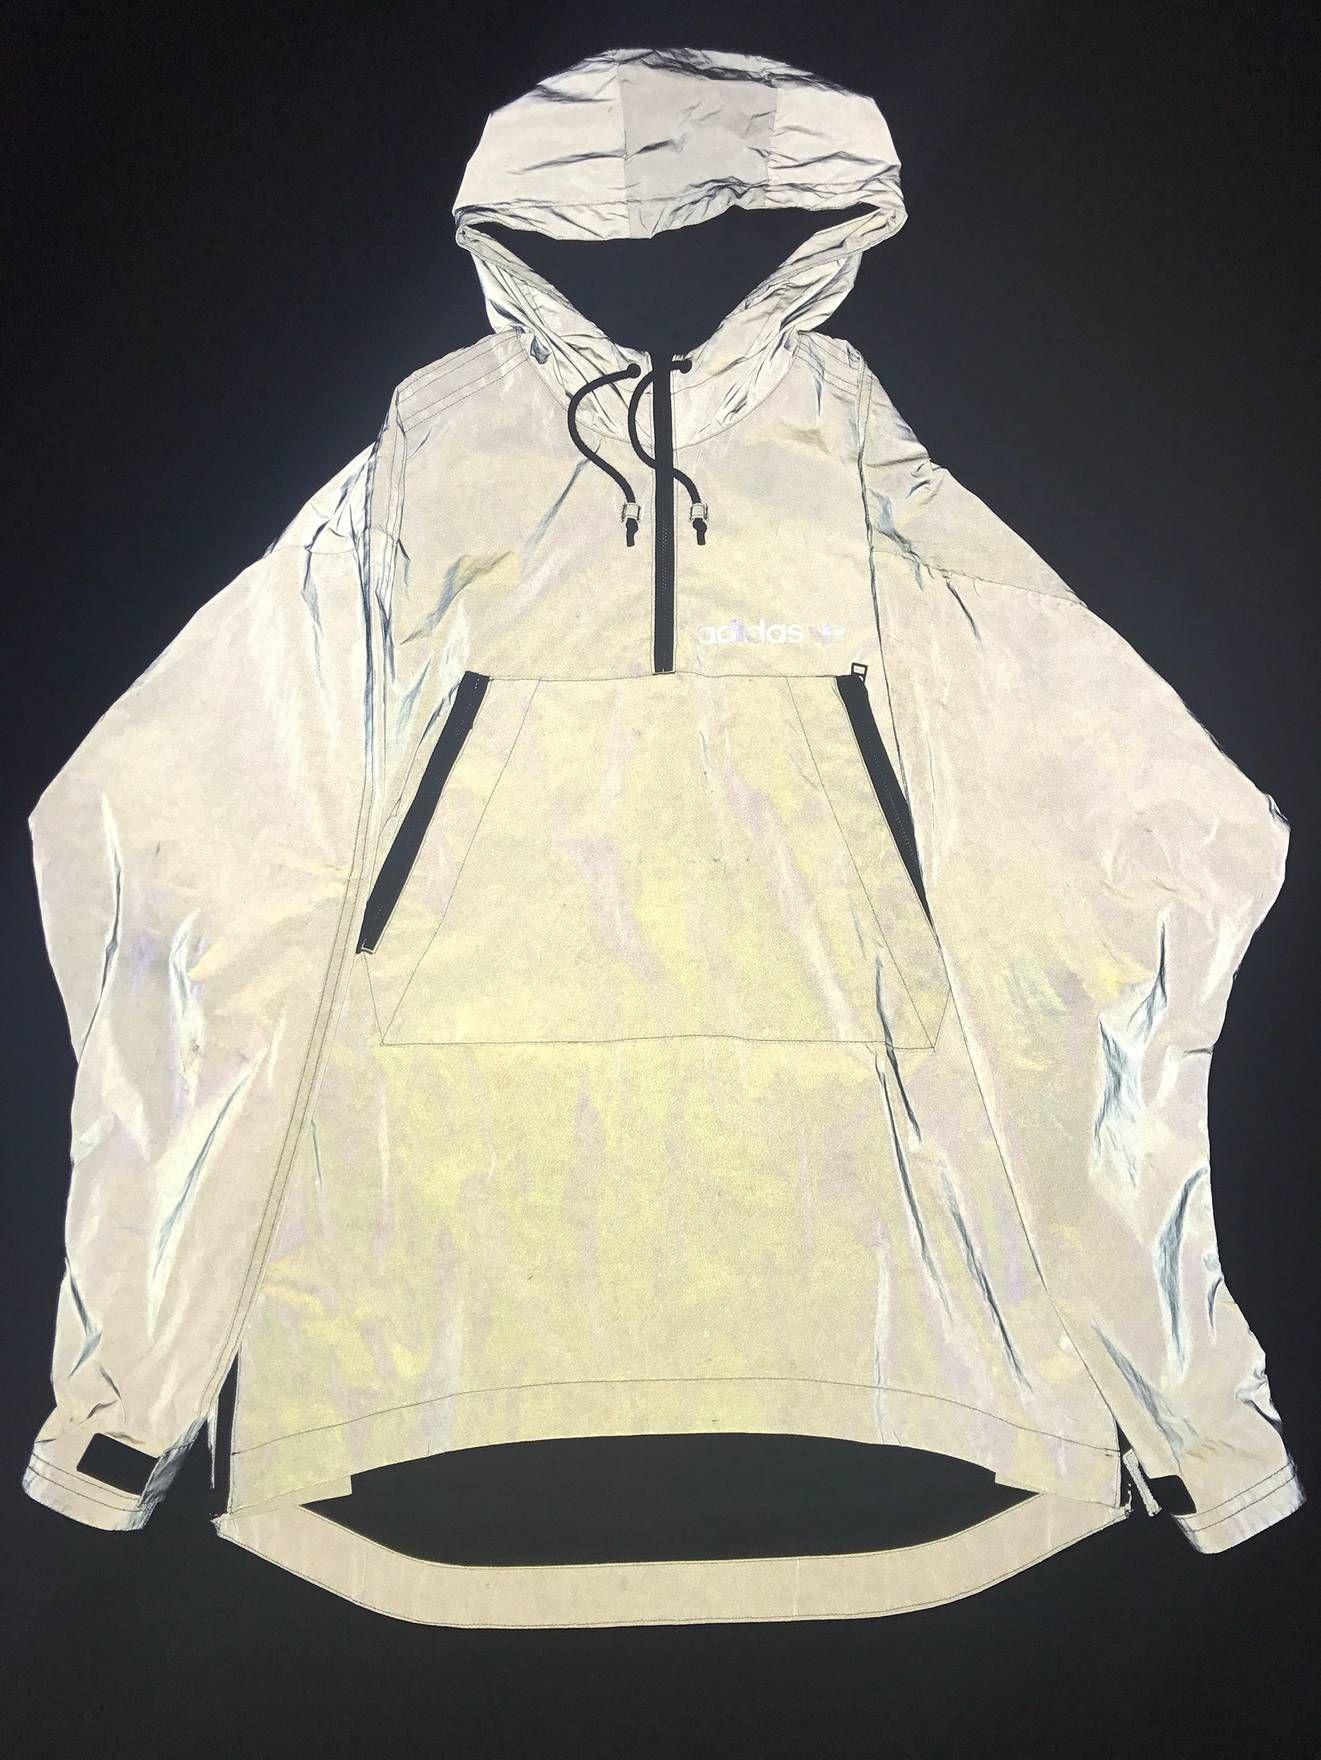 06d693646722c5 Adidas Adidas 3m Reflective Jacket Poncho M Size US M   EU 48-50   2 ...